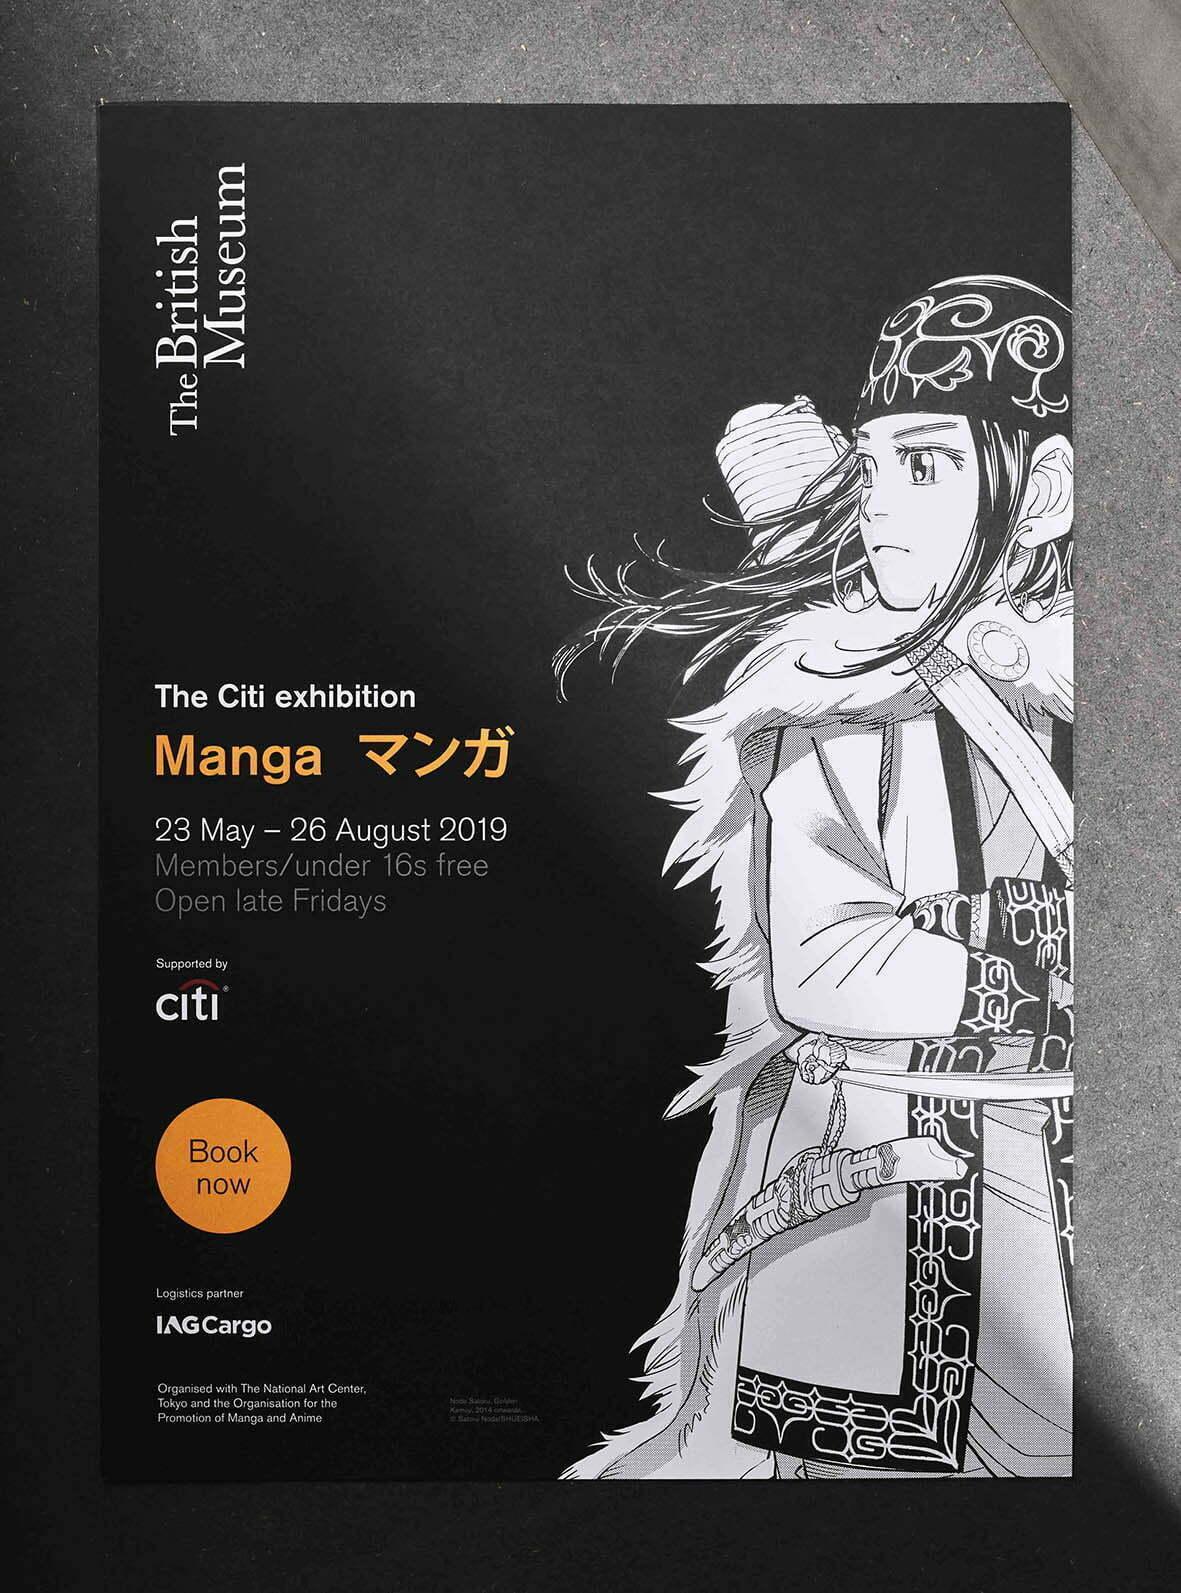 _03_Lombaert_Studio_British_Museum_Manga_10LR